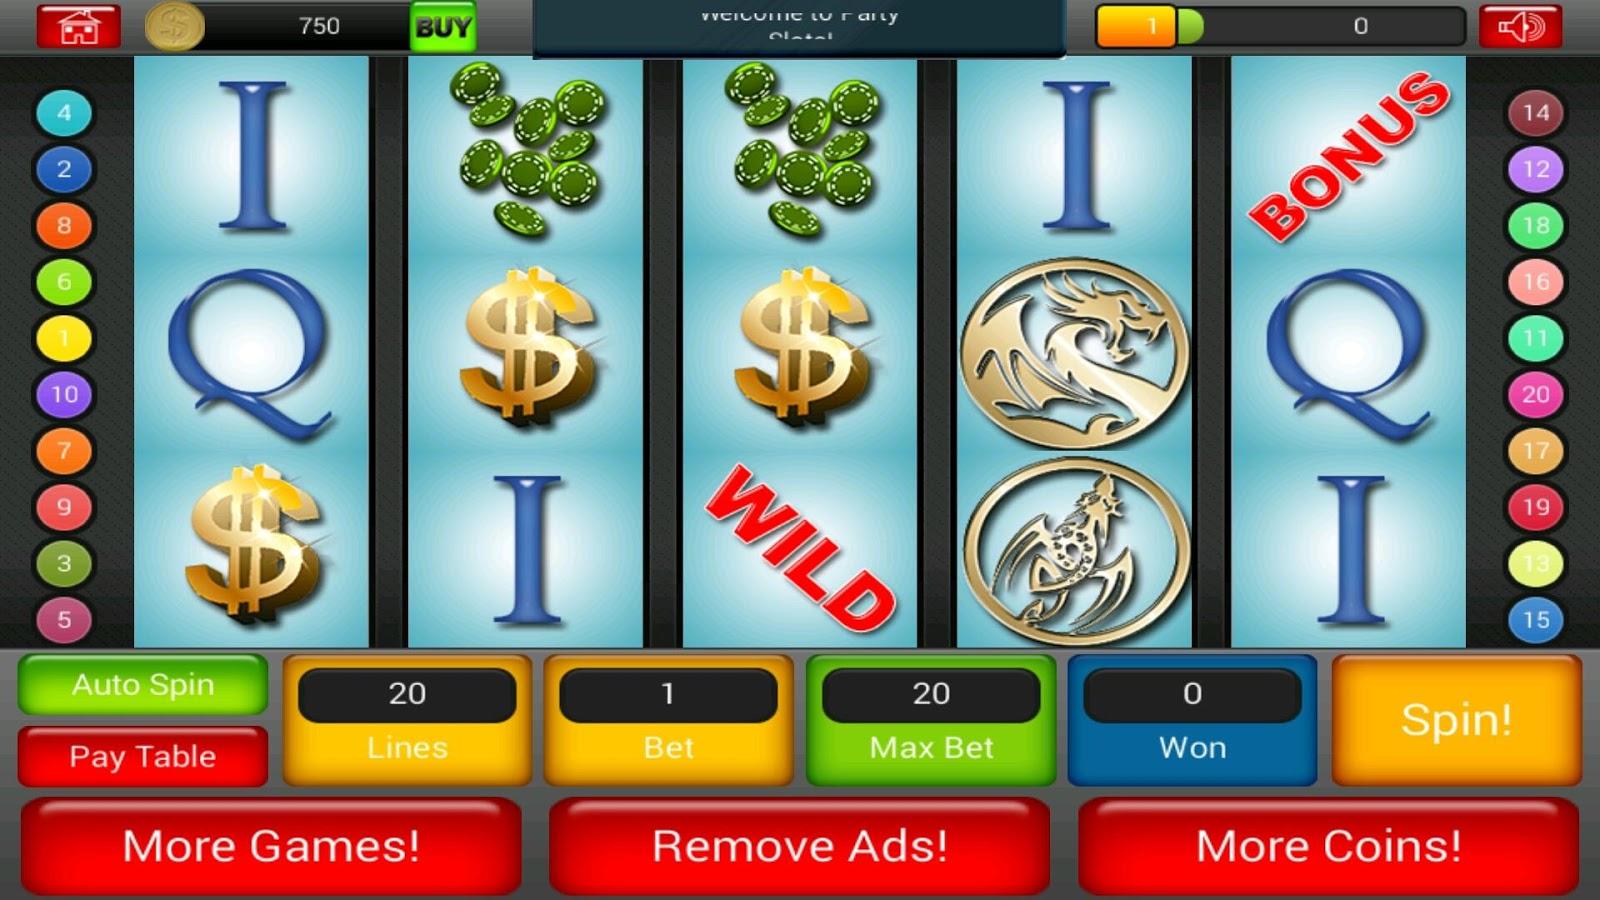 Real slots app